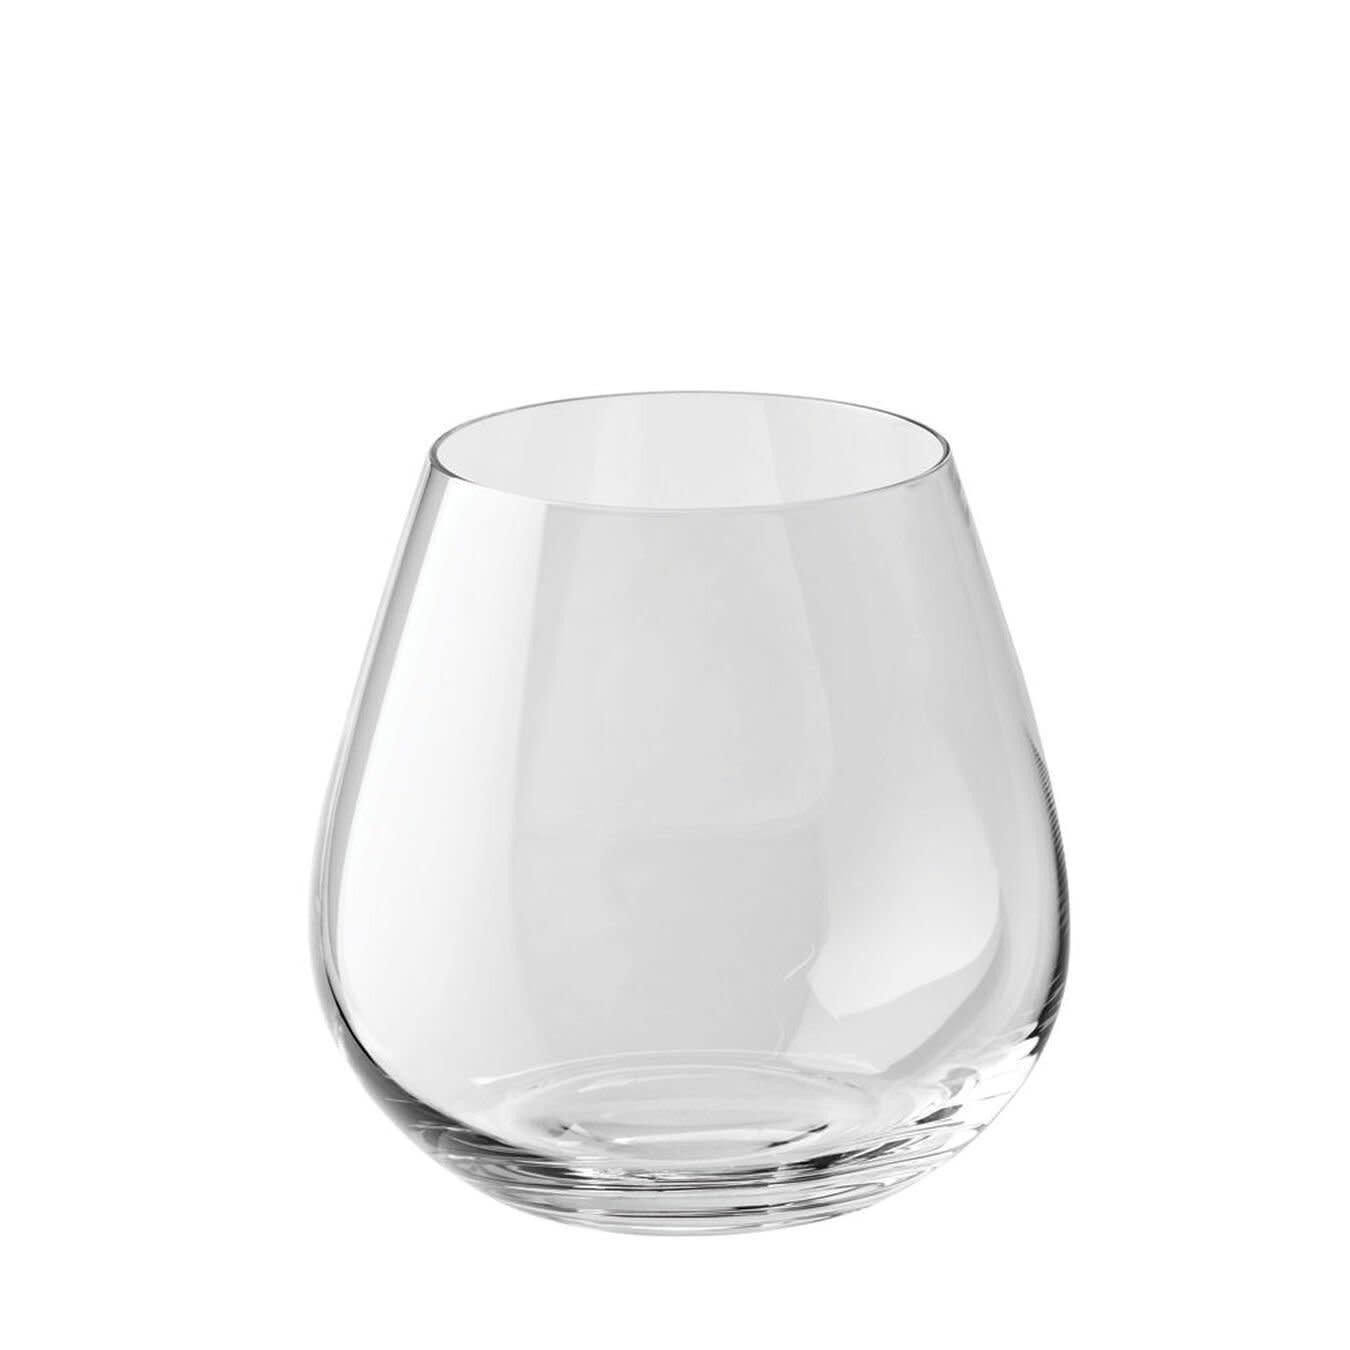 Zwilling J.A. Henckels Predicat S/6 Whisky Glasses 604ml /20.4oz